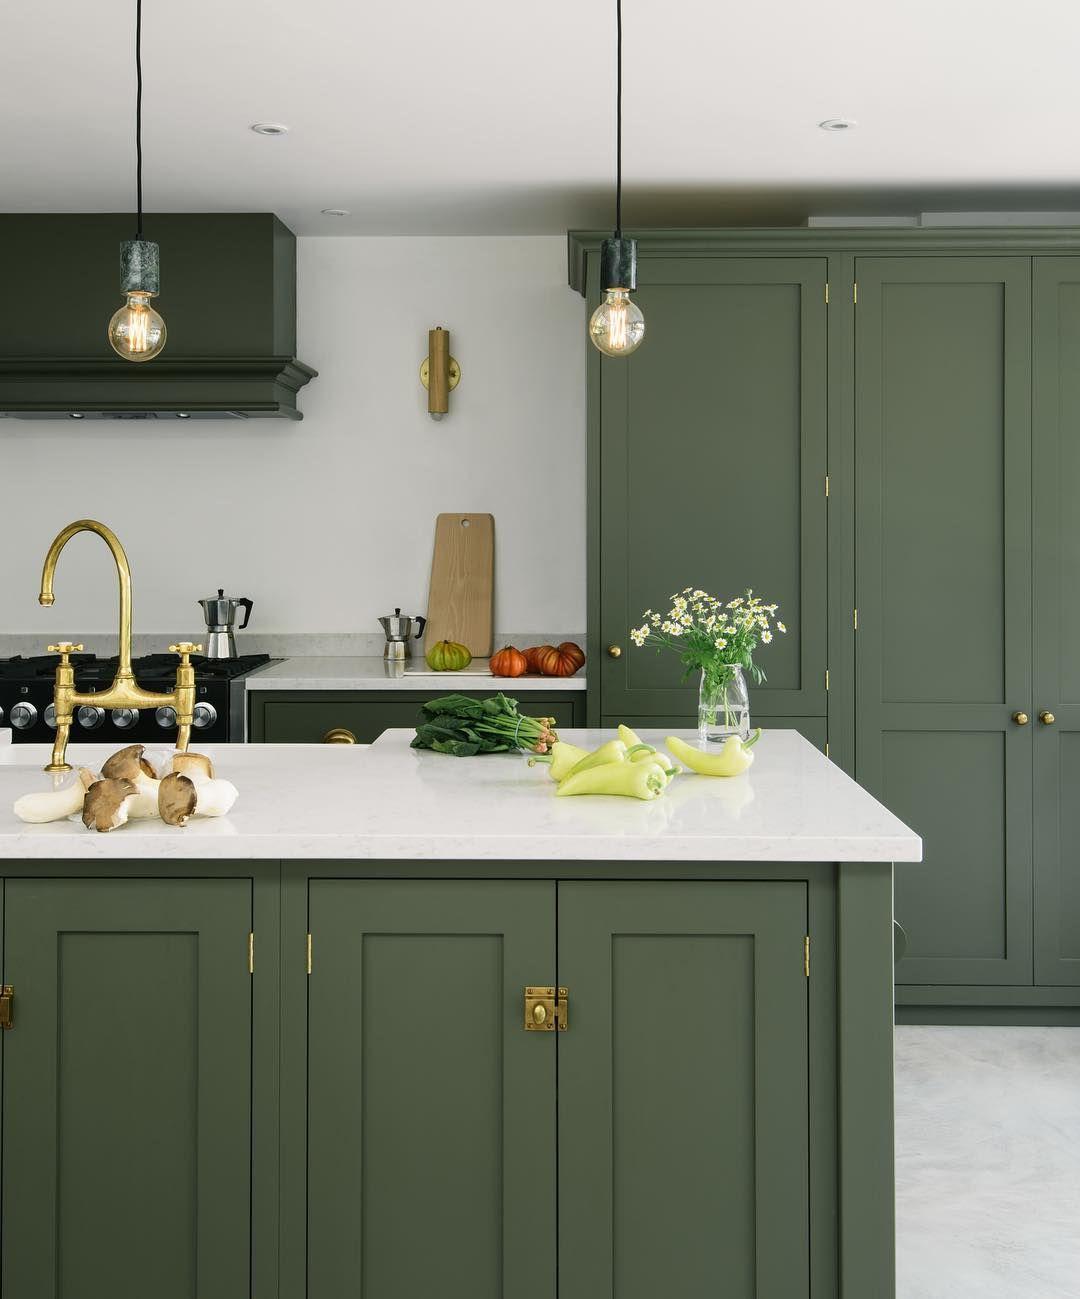 "deVOL Kitchens on Instagram: ""A classic deep olive green ..."